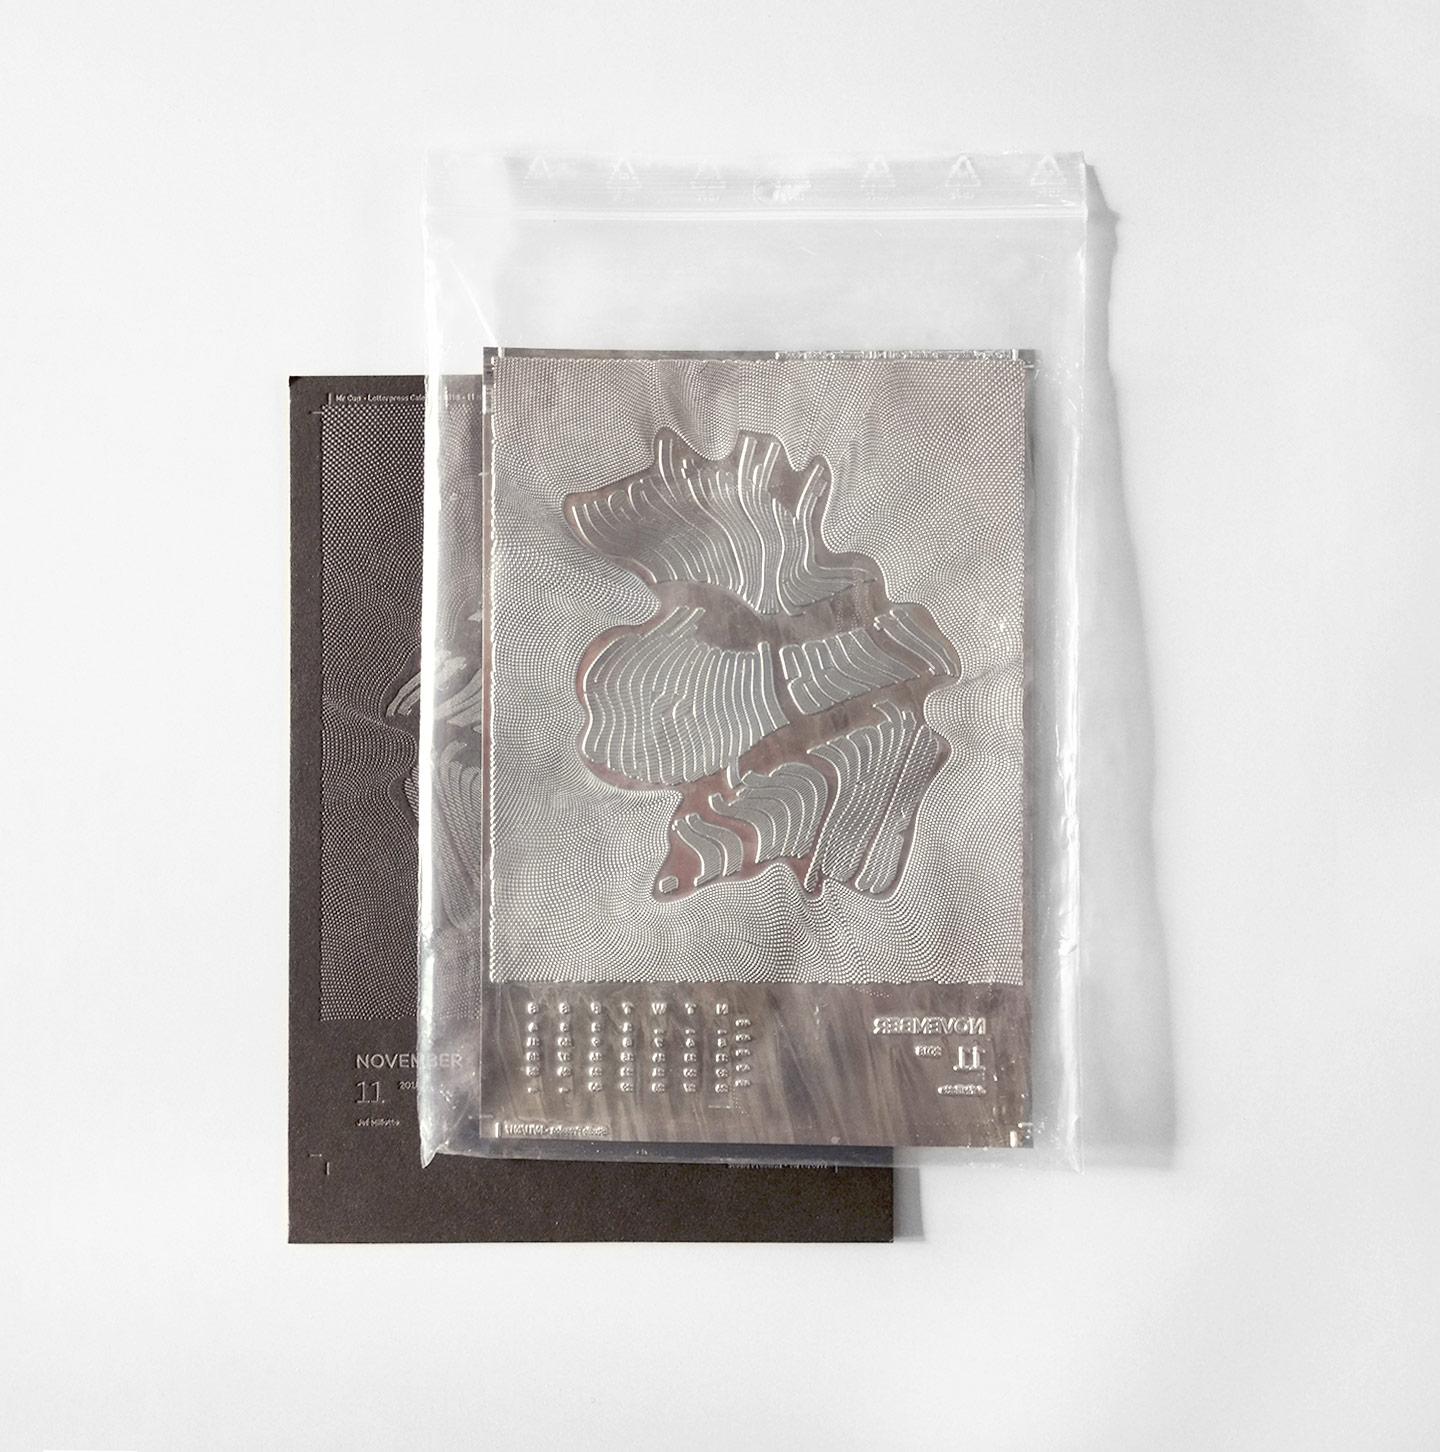 calendar-jefmillotte-05-1